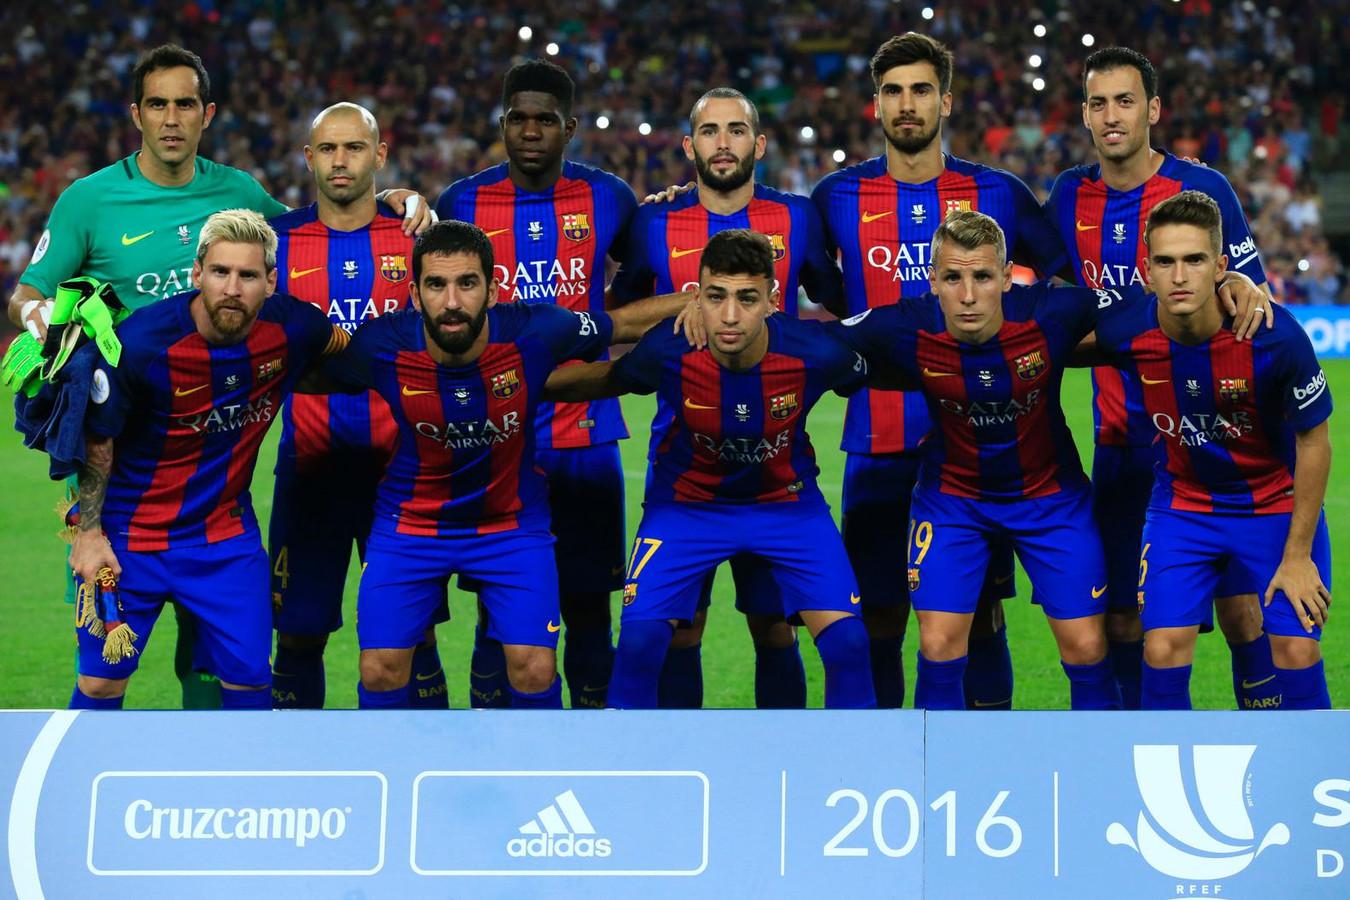 Barcelona Fc Foto >> FC Barcelona wint twaalfde Spaanse Supercup | Foto | AD.nl